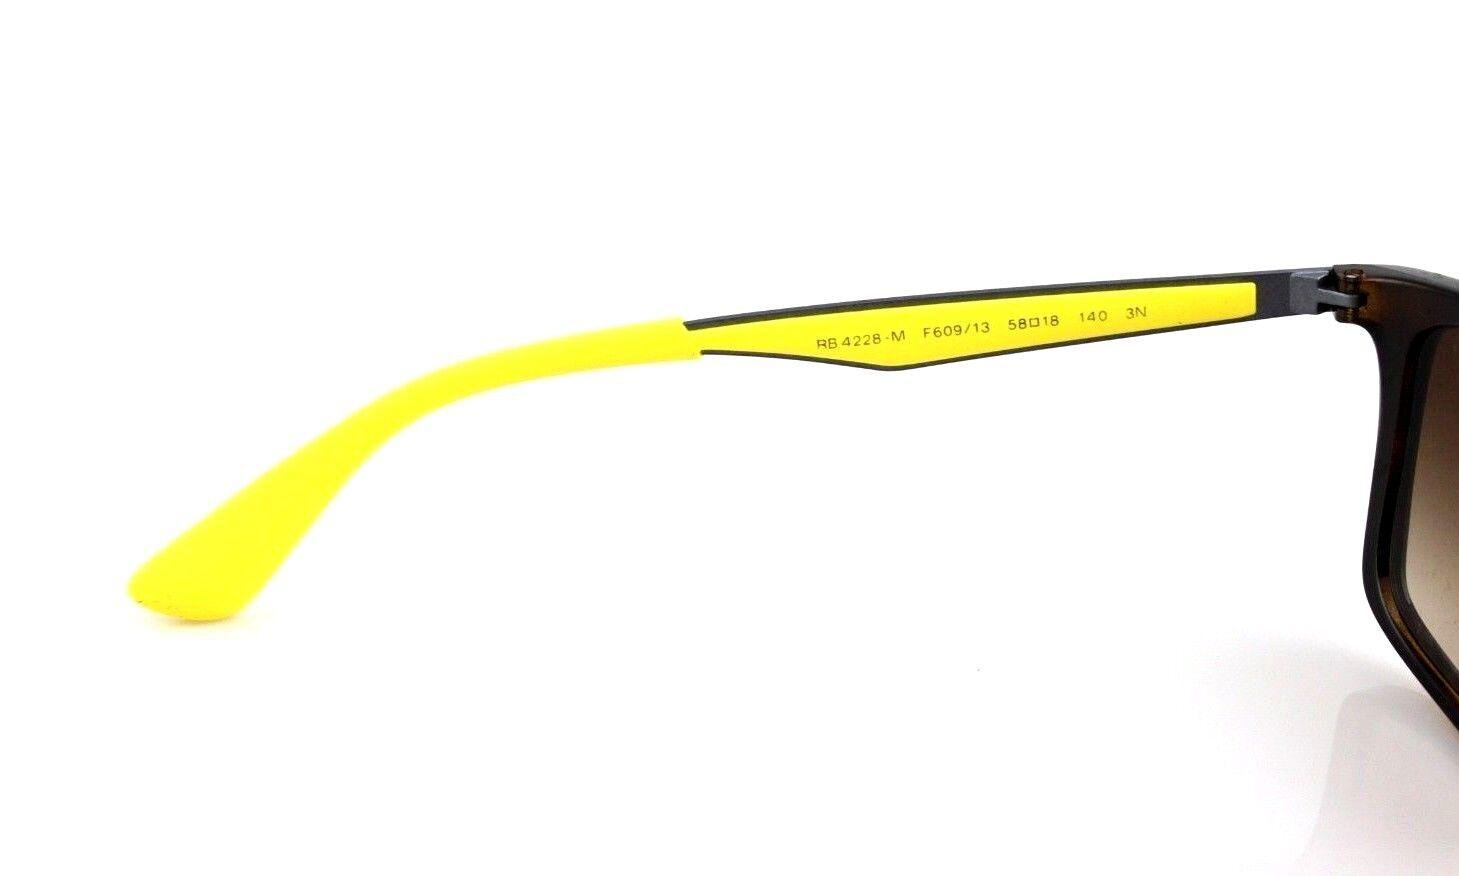 6cfdb17590e Scuderia Ferrari Ray-Ban Tortoise Yellow Sunglasses RB 4228-m F60913 58 Mm  for sale online